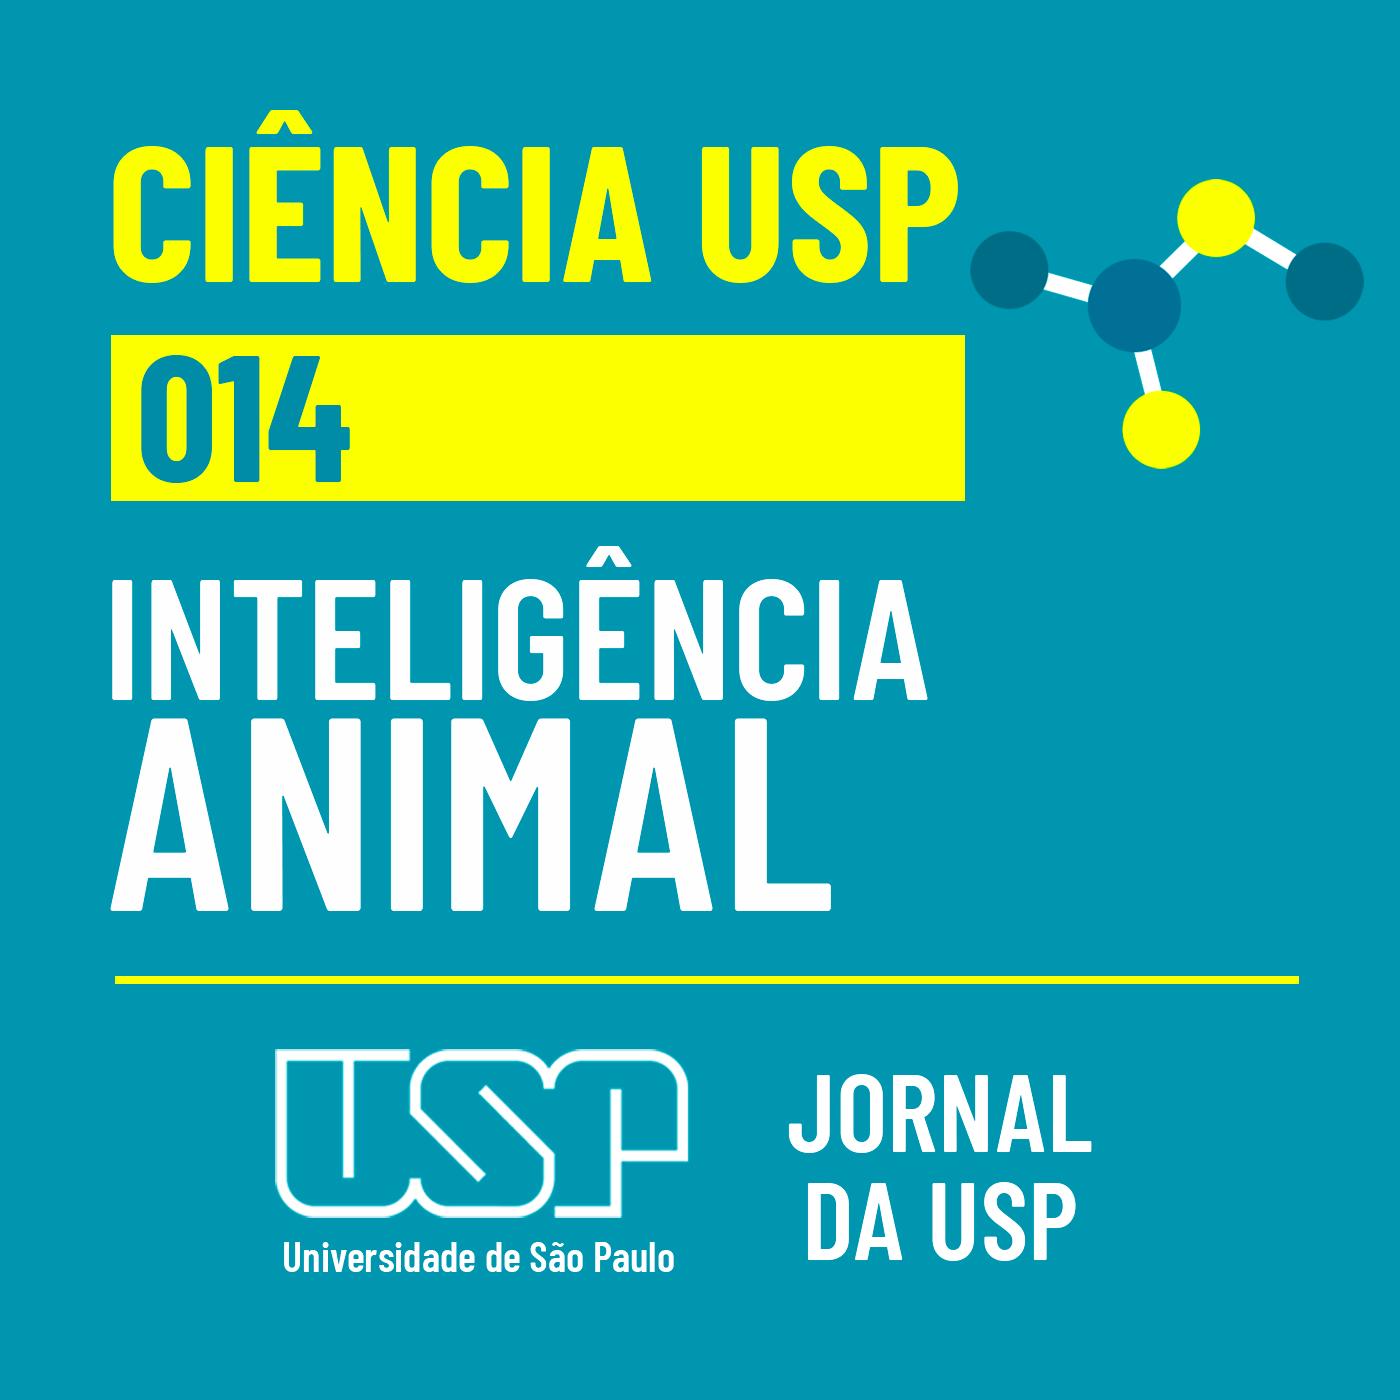 Ciência USP #14: Será que a inteligência é exclusiva dos seres humanos?